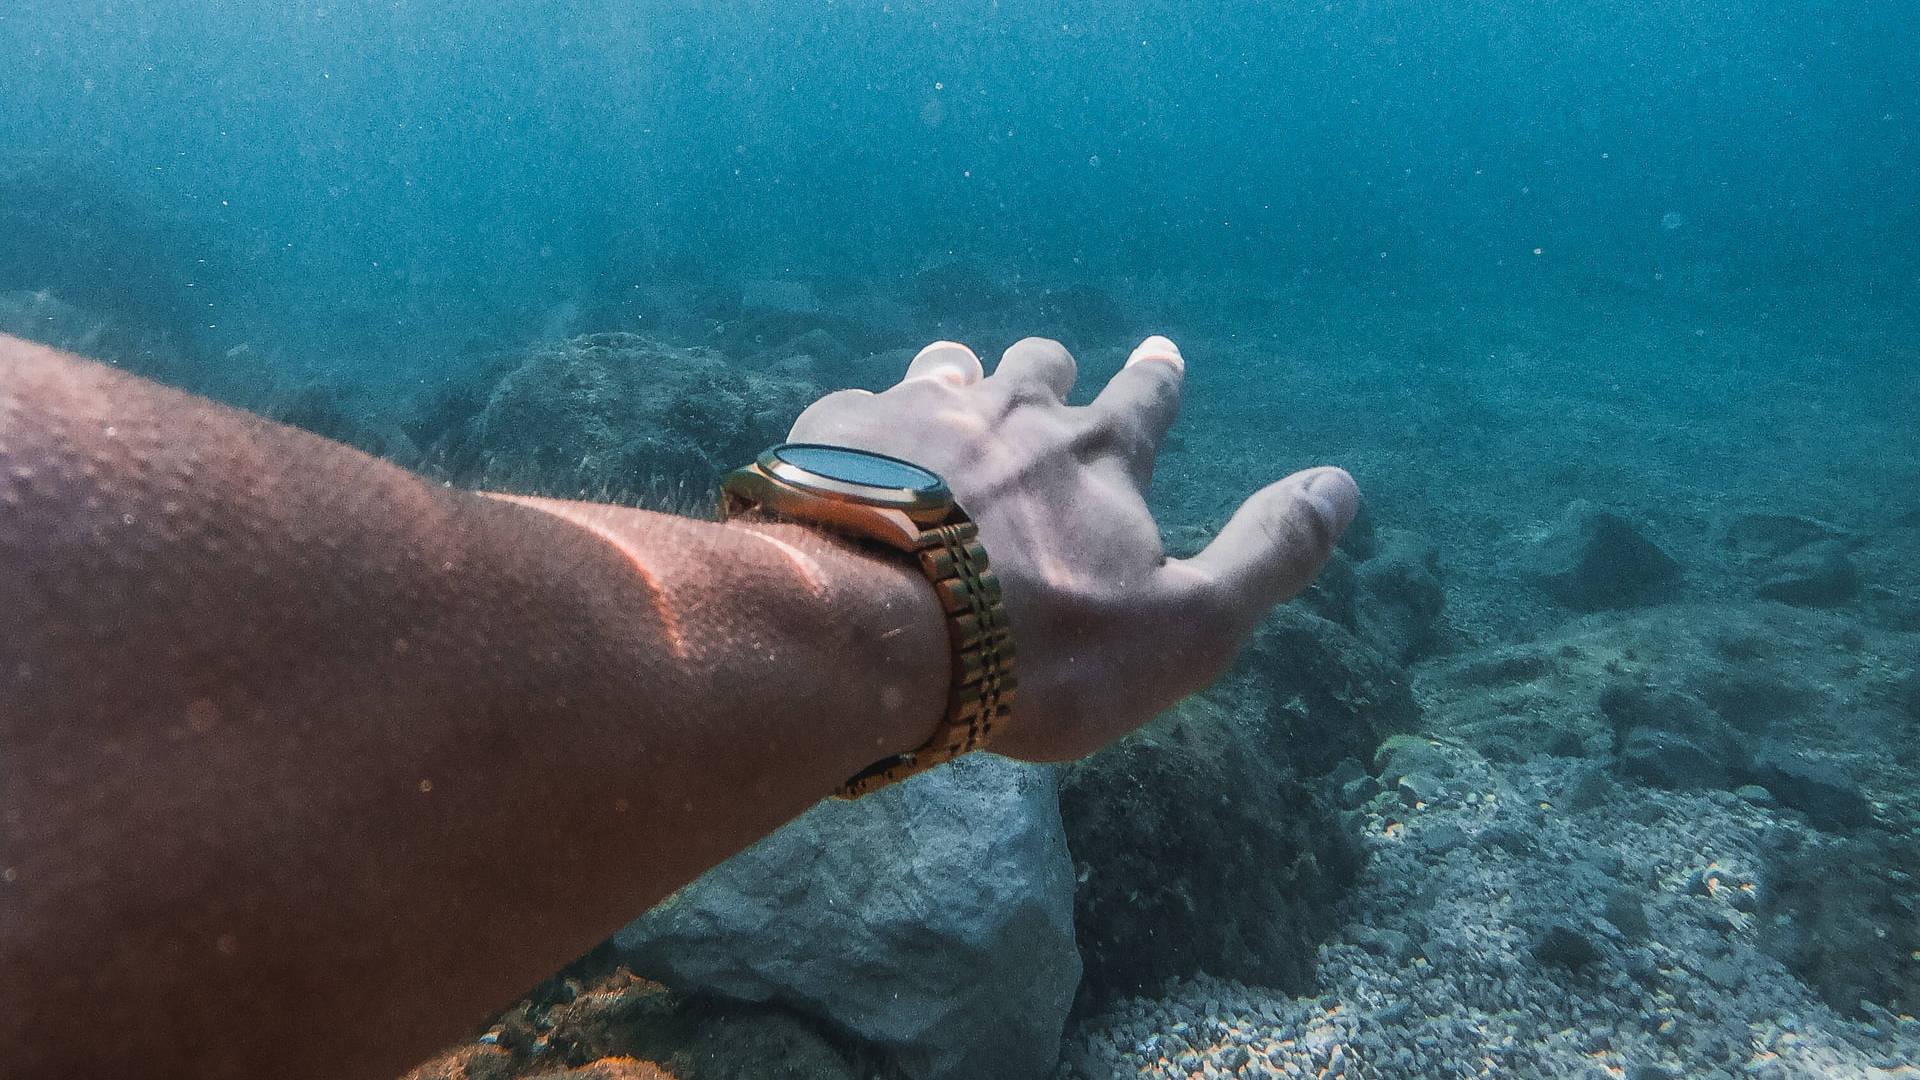 Watch being used by Kilmarnock customer after waterproof testing